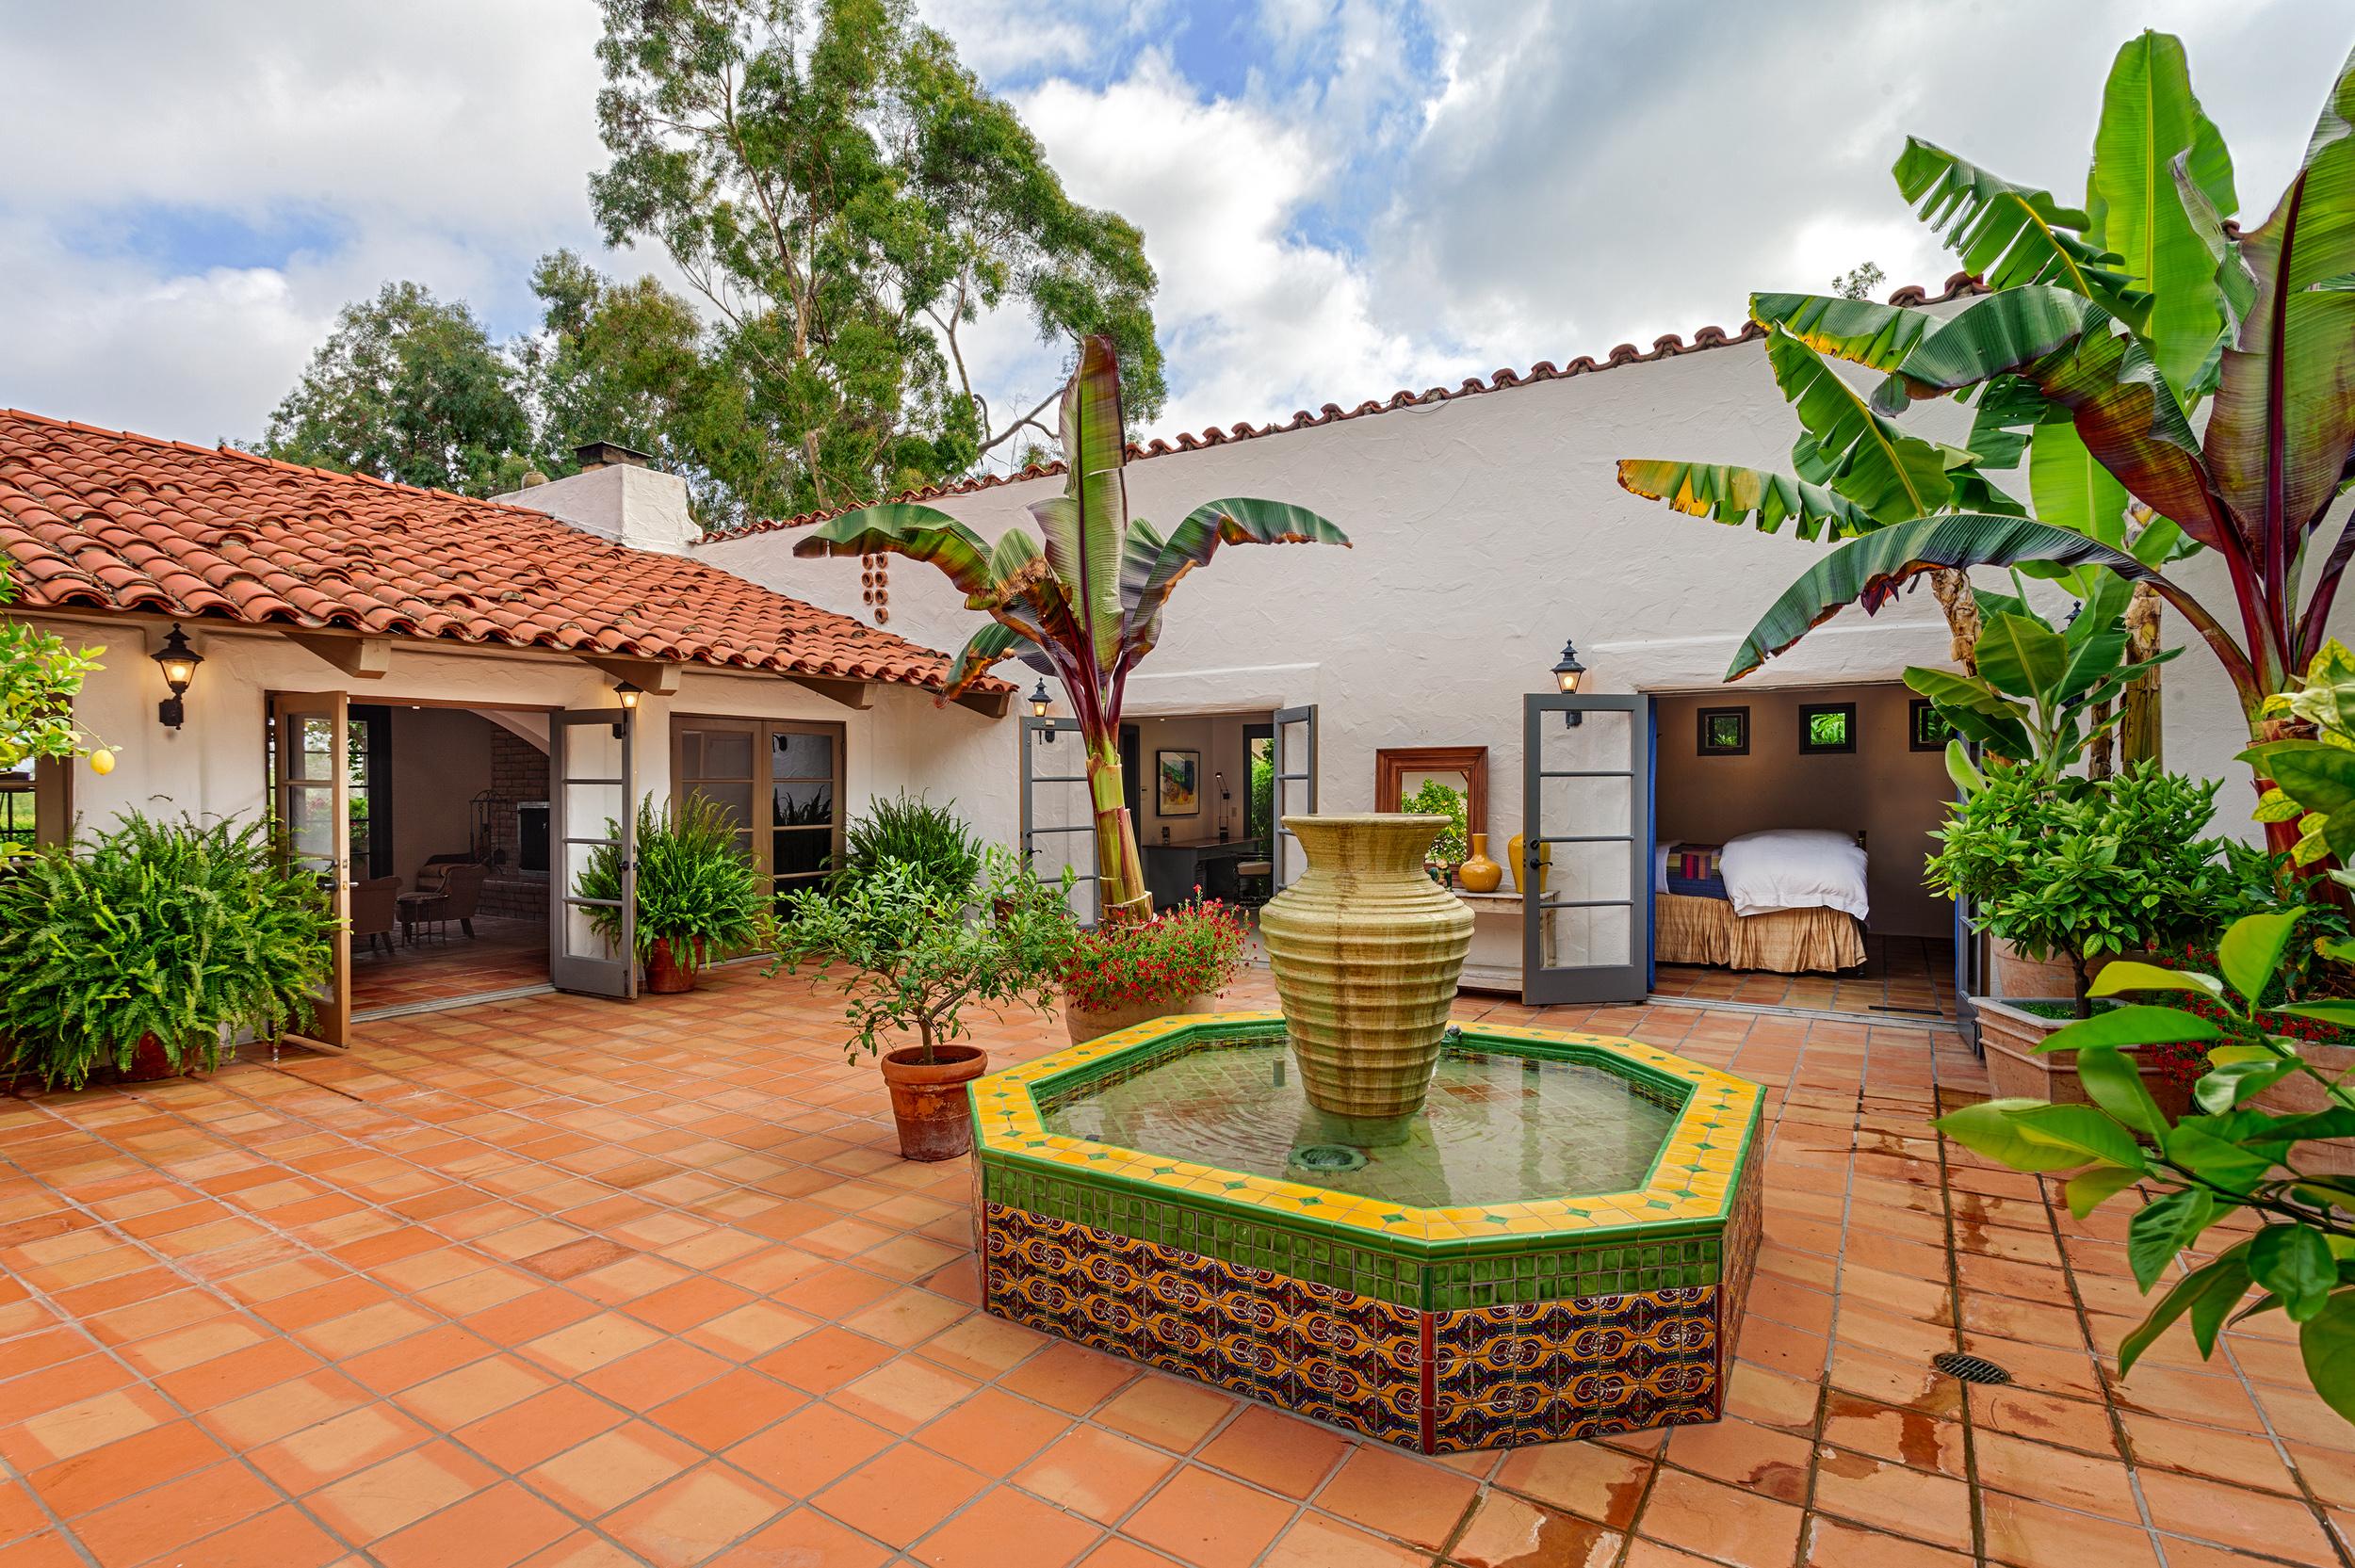 Sold 2014 Represented Buyer & Seller -  Rancho Santa Fe, CA 92067